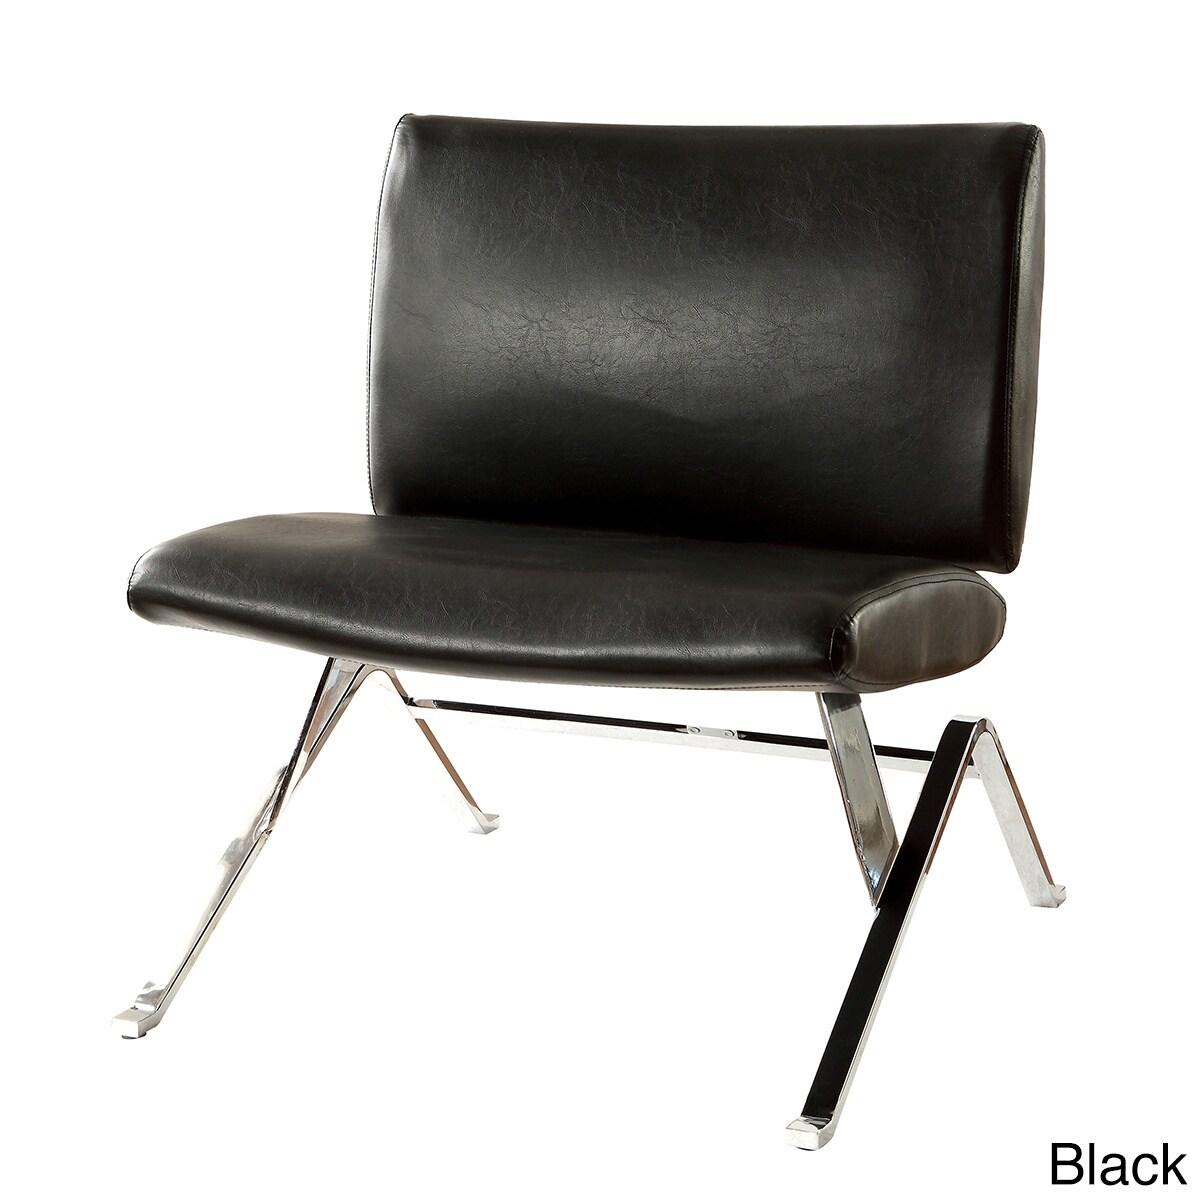 Furniture of America Kelma Contemporary Faux Leather Acce...